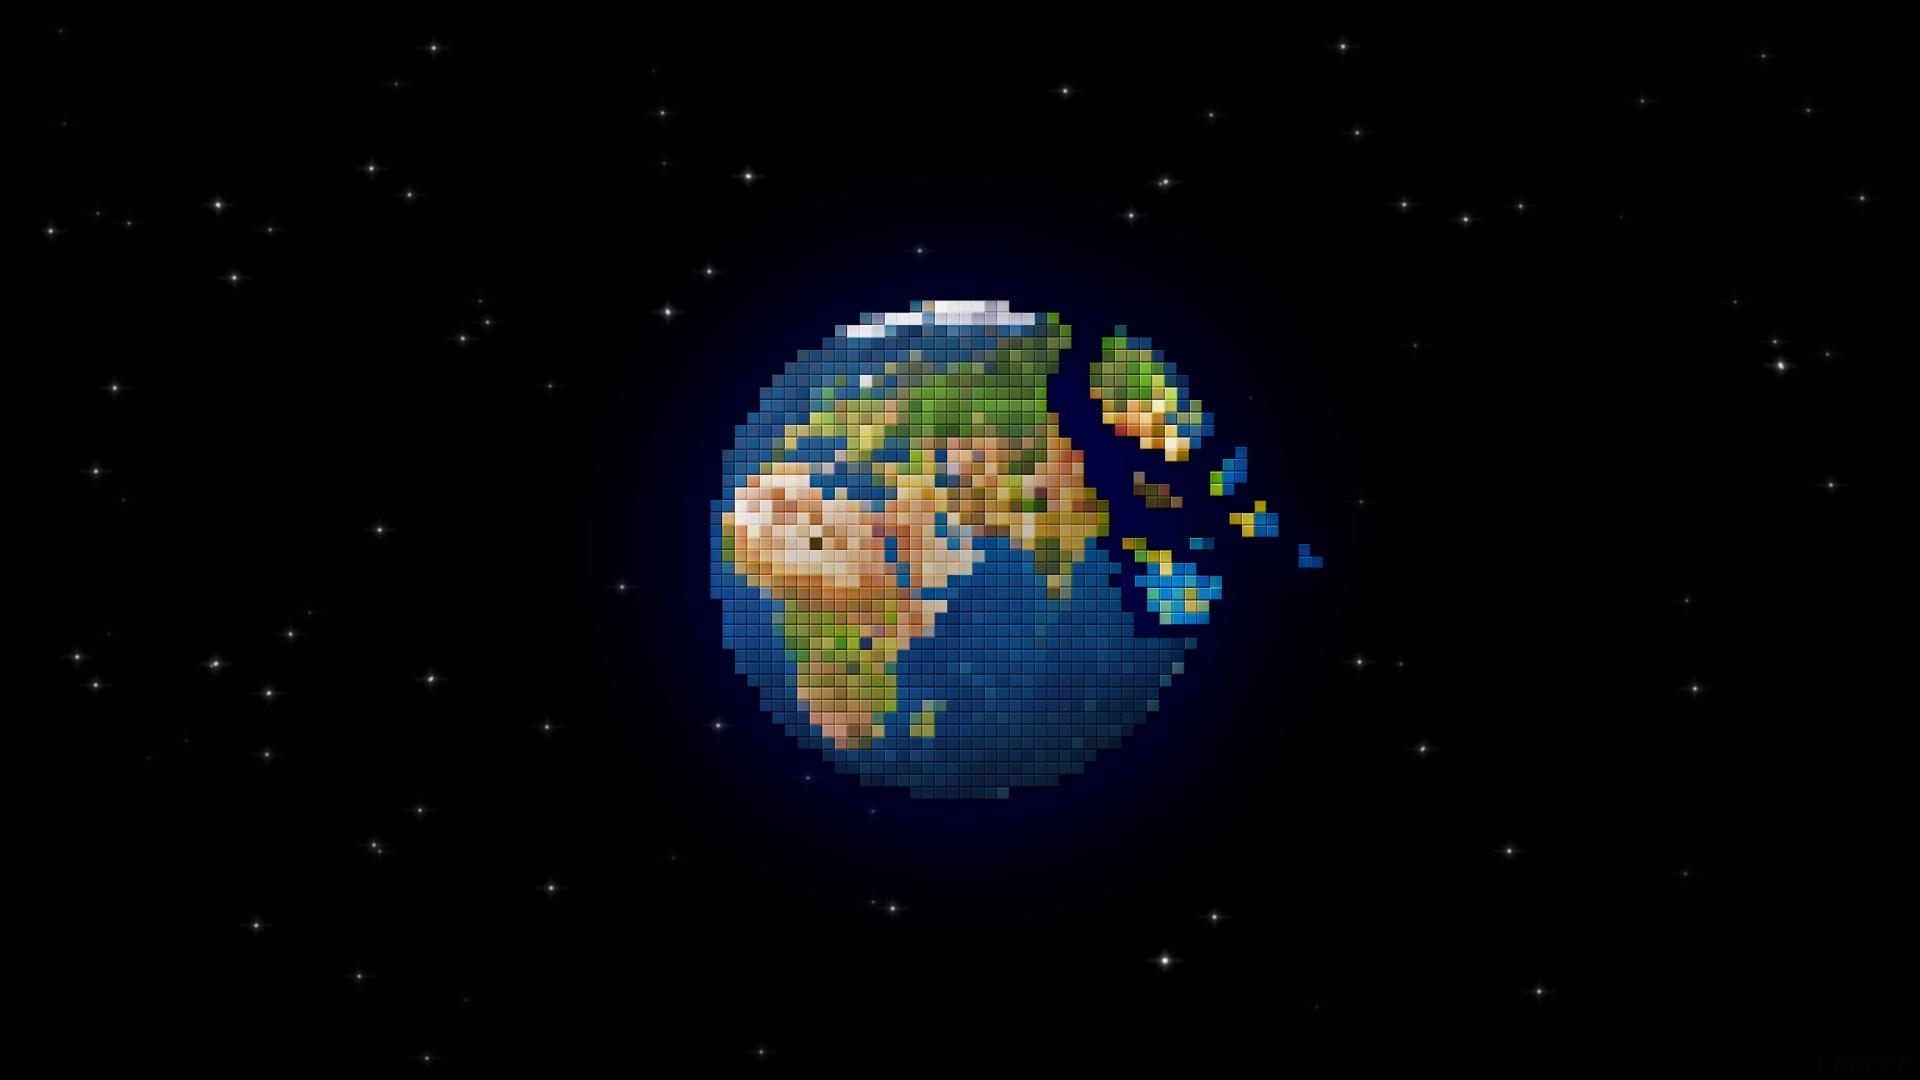 Pixel Earth 4k Ultra Fondo De Pantalla Hd Fondo De